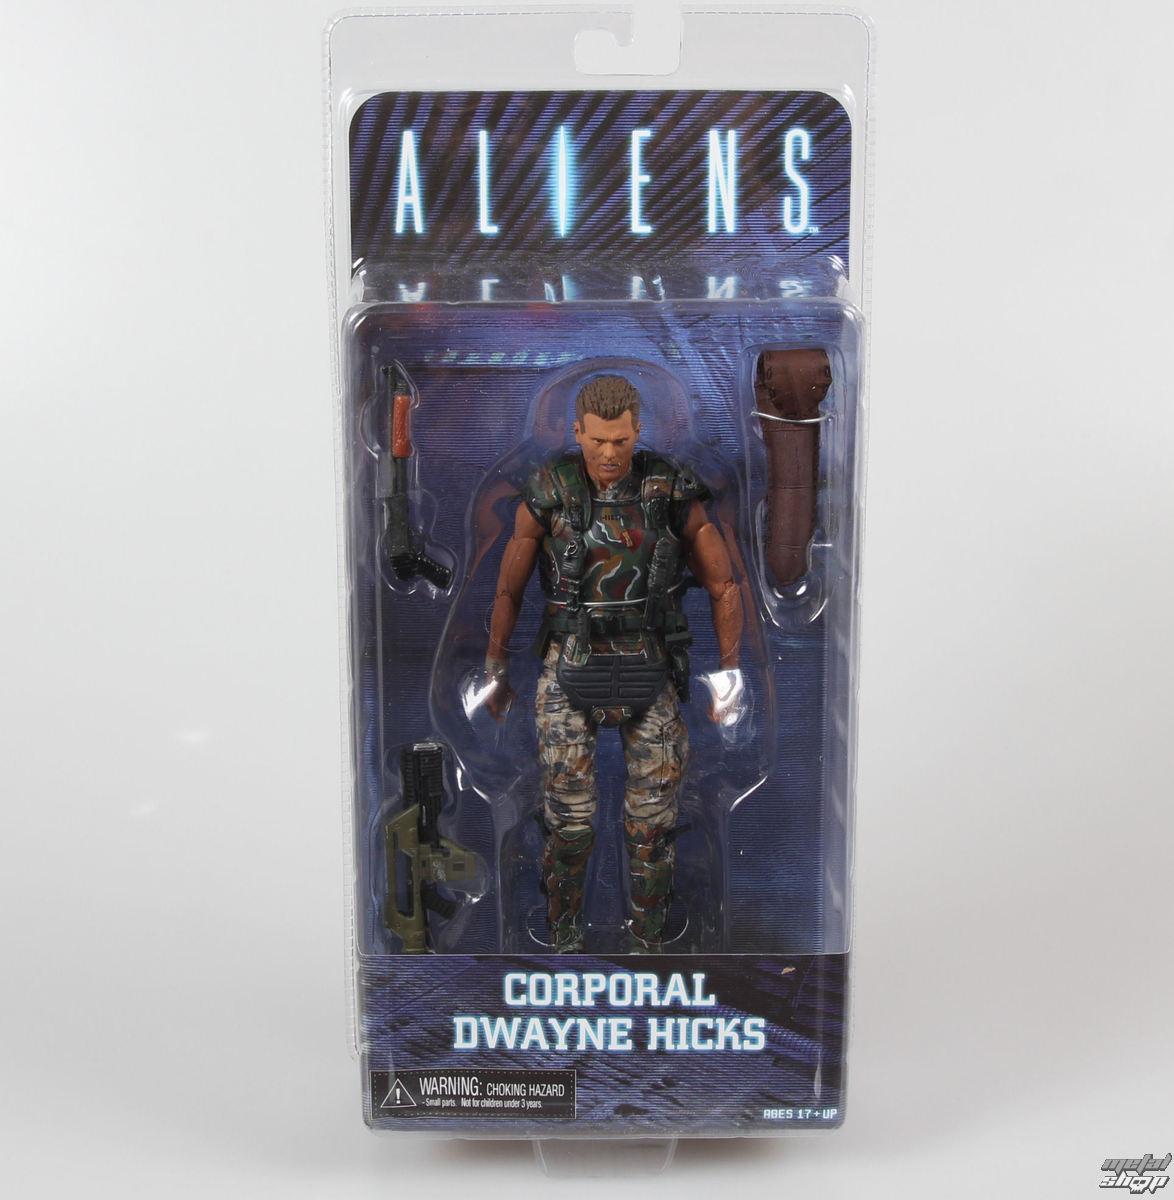 figúrka Alien - Corporal Dwayne Hicks - 9009